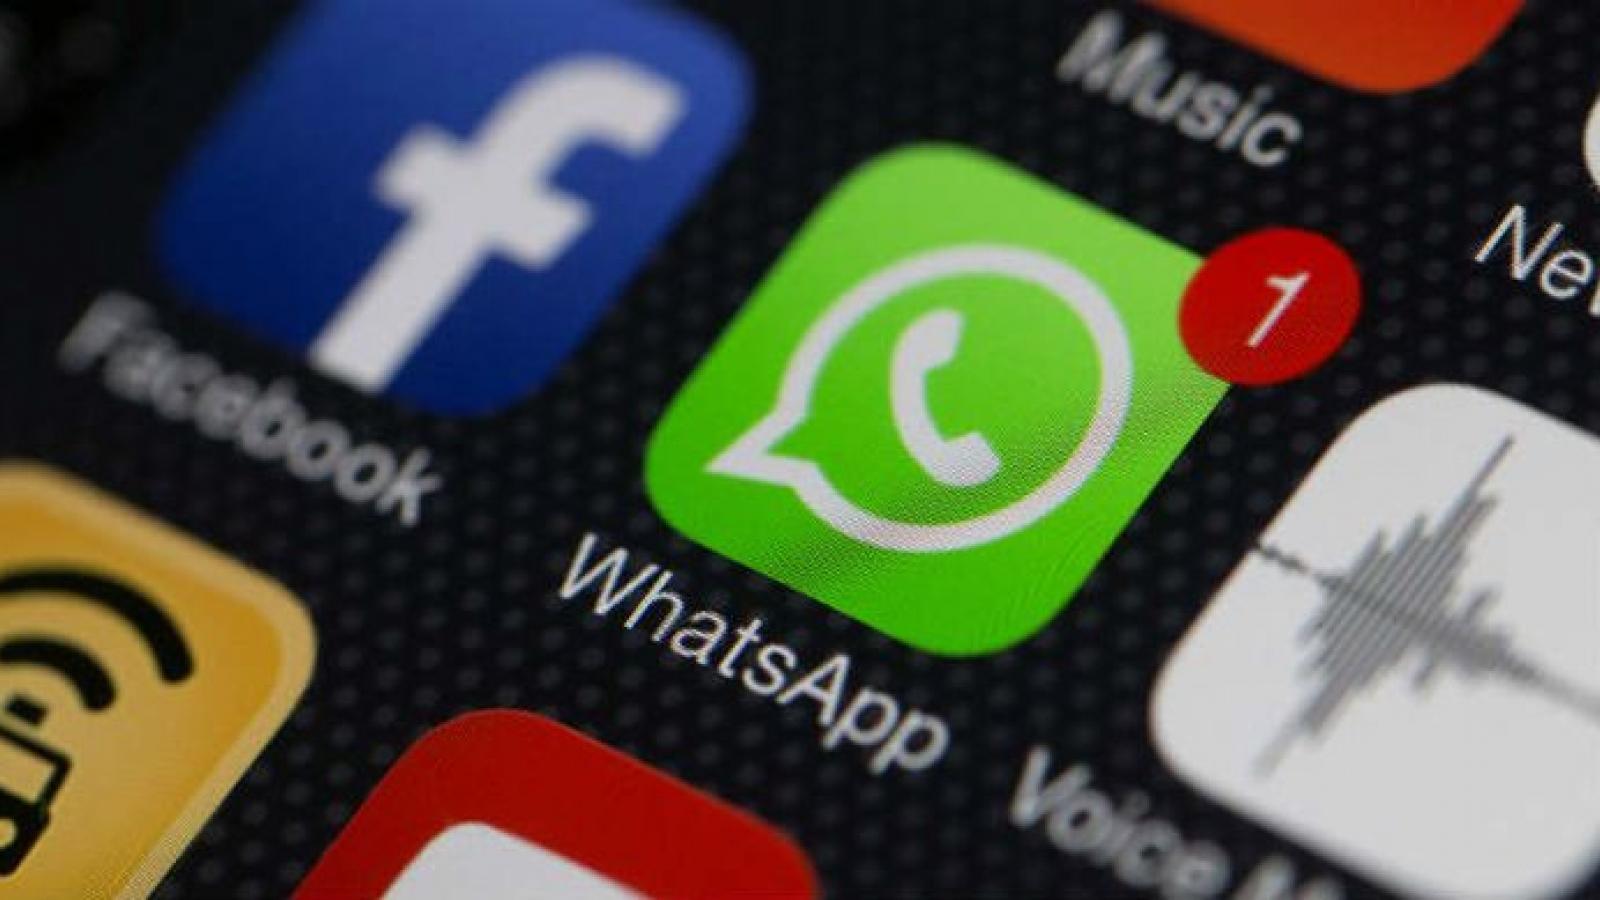 Ireland phạt WhatsApp 225 triệu EUR vì vi phạm GDPR